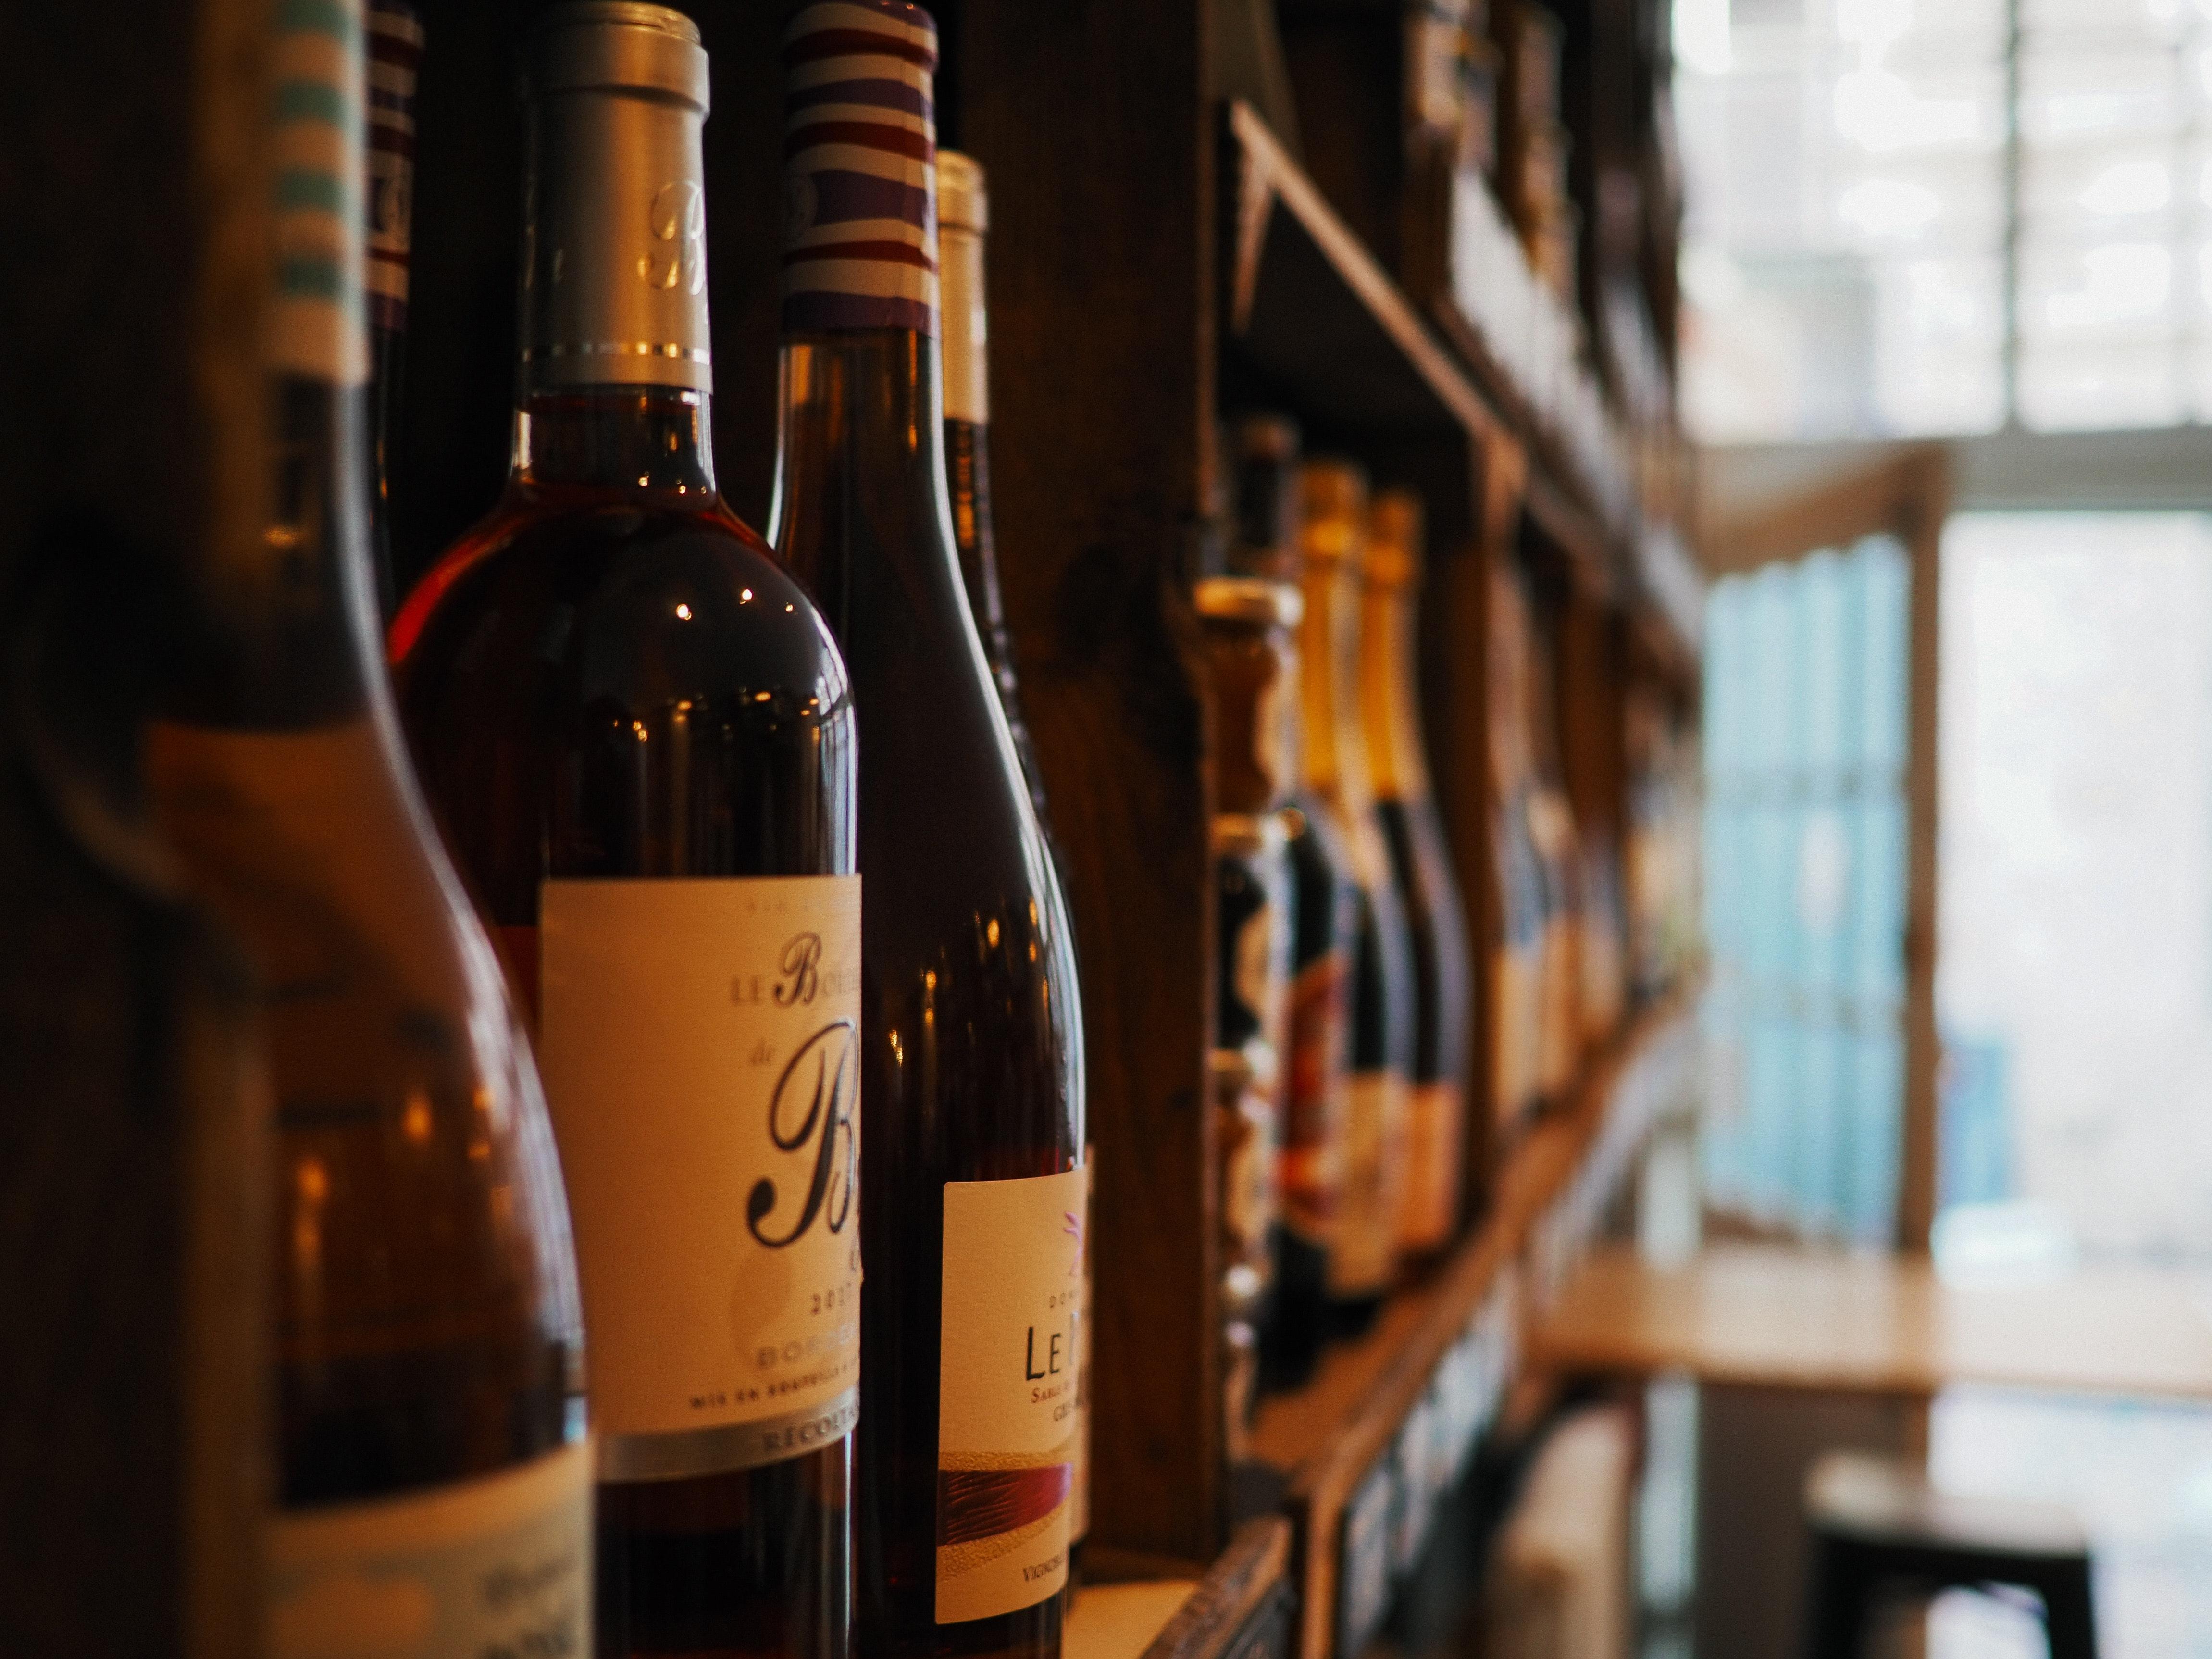 alkoholflasker-alkoholholdig-drikkevare-bar-brennevin-2664149